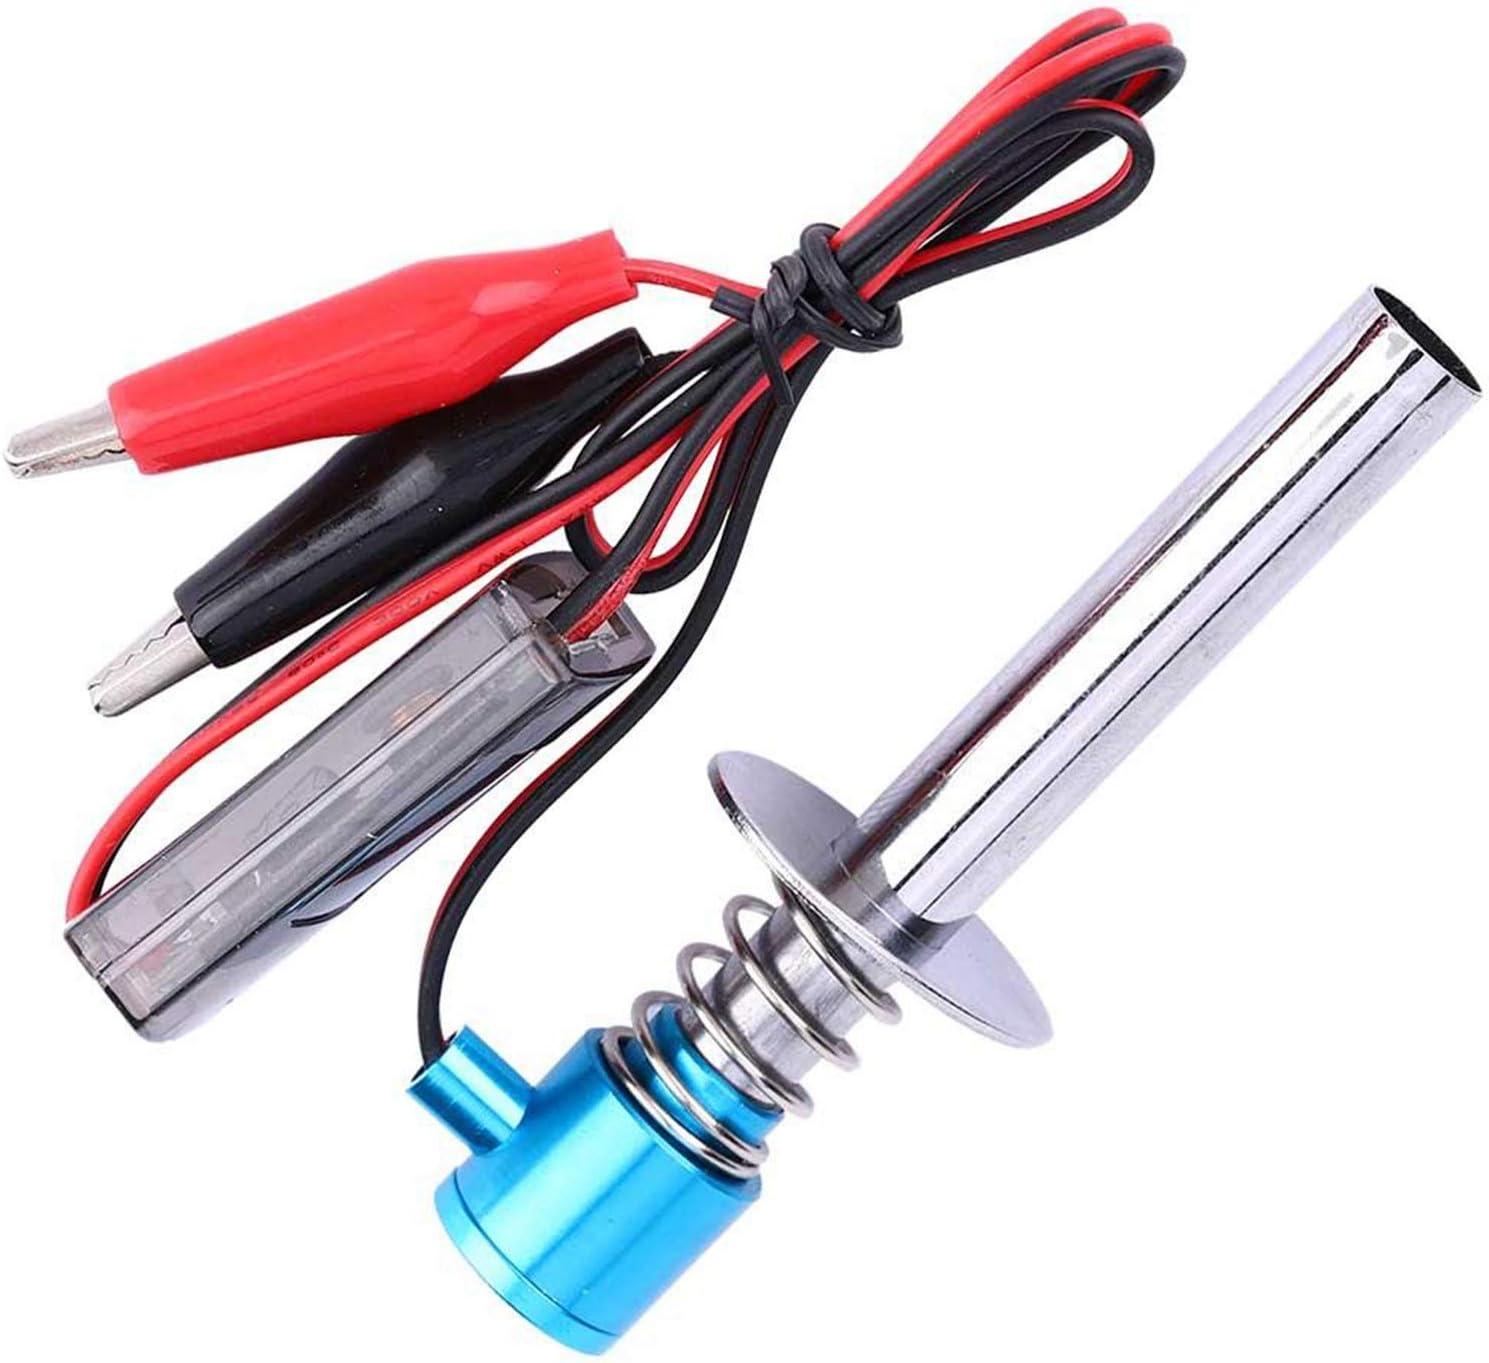 24V Electronic Glow Plug Starter Igniter Fit for Nitro RC Car Engine-Blue Nrpfell 6V